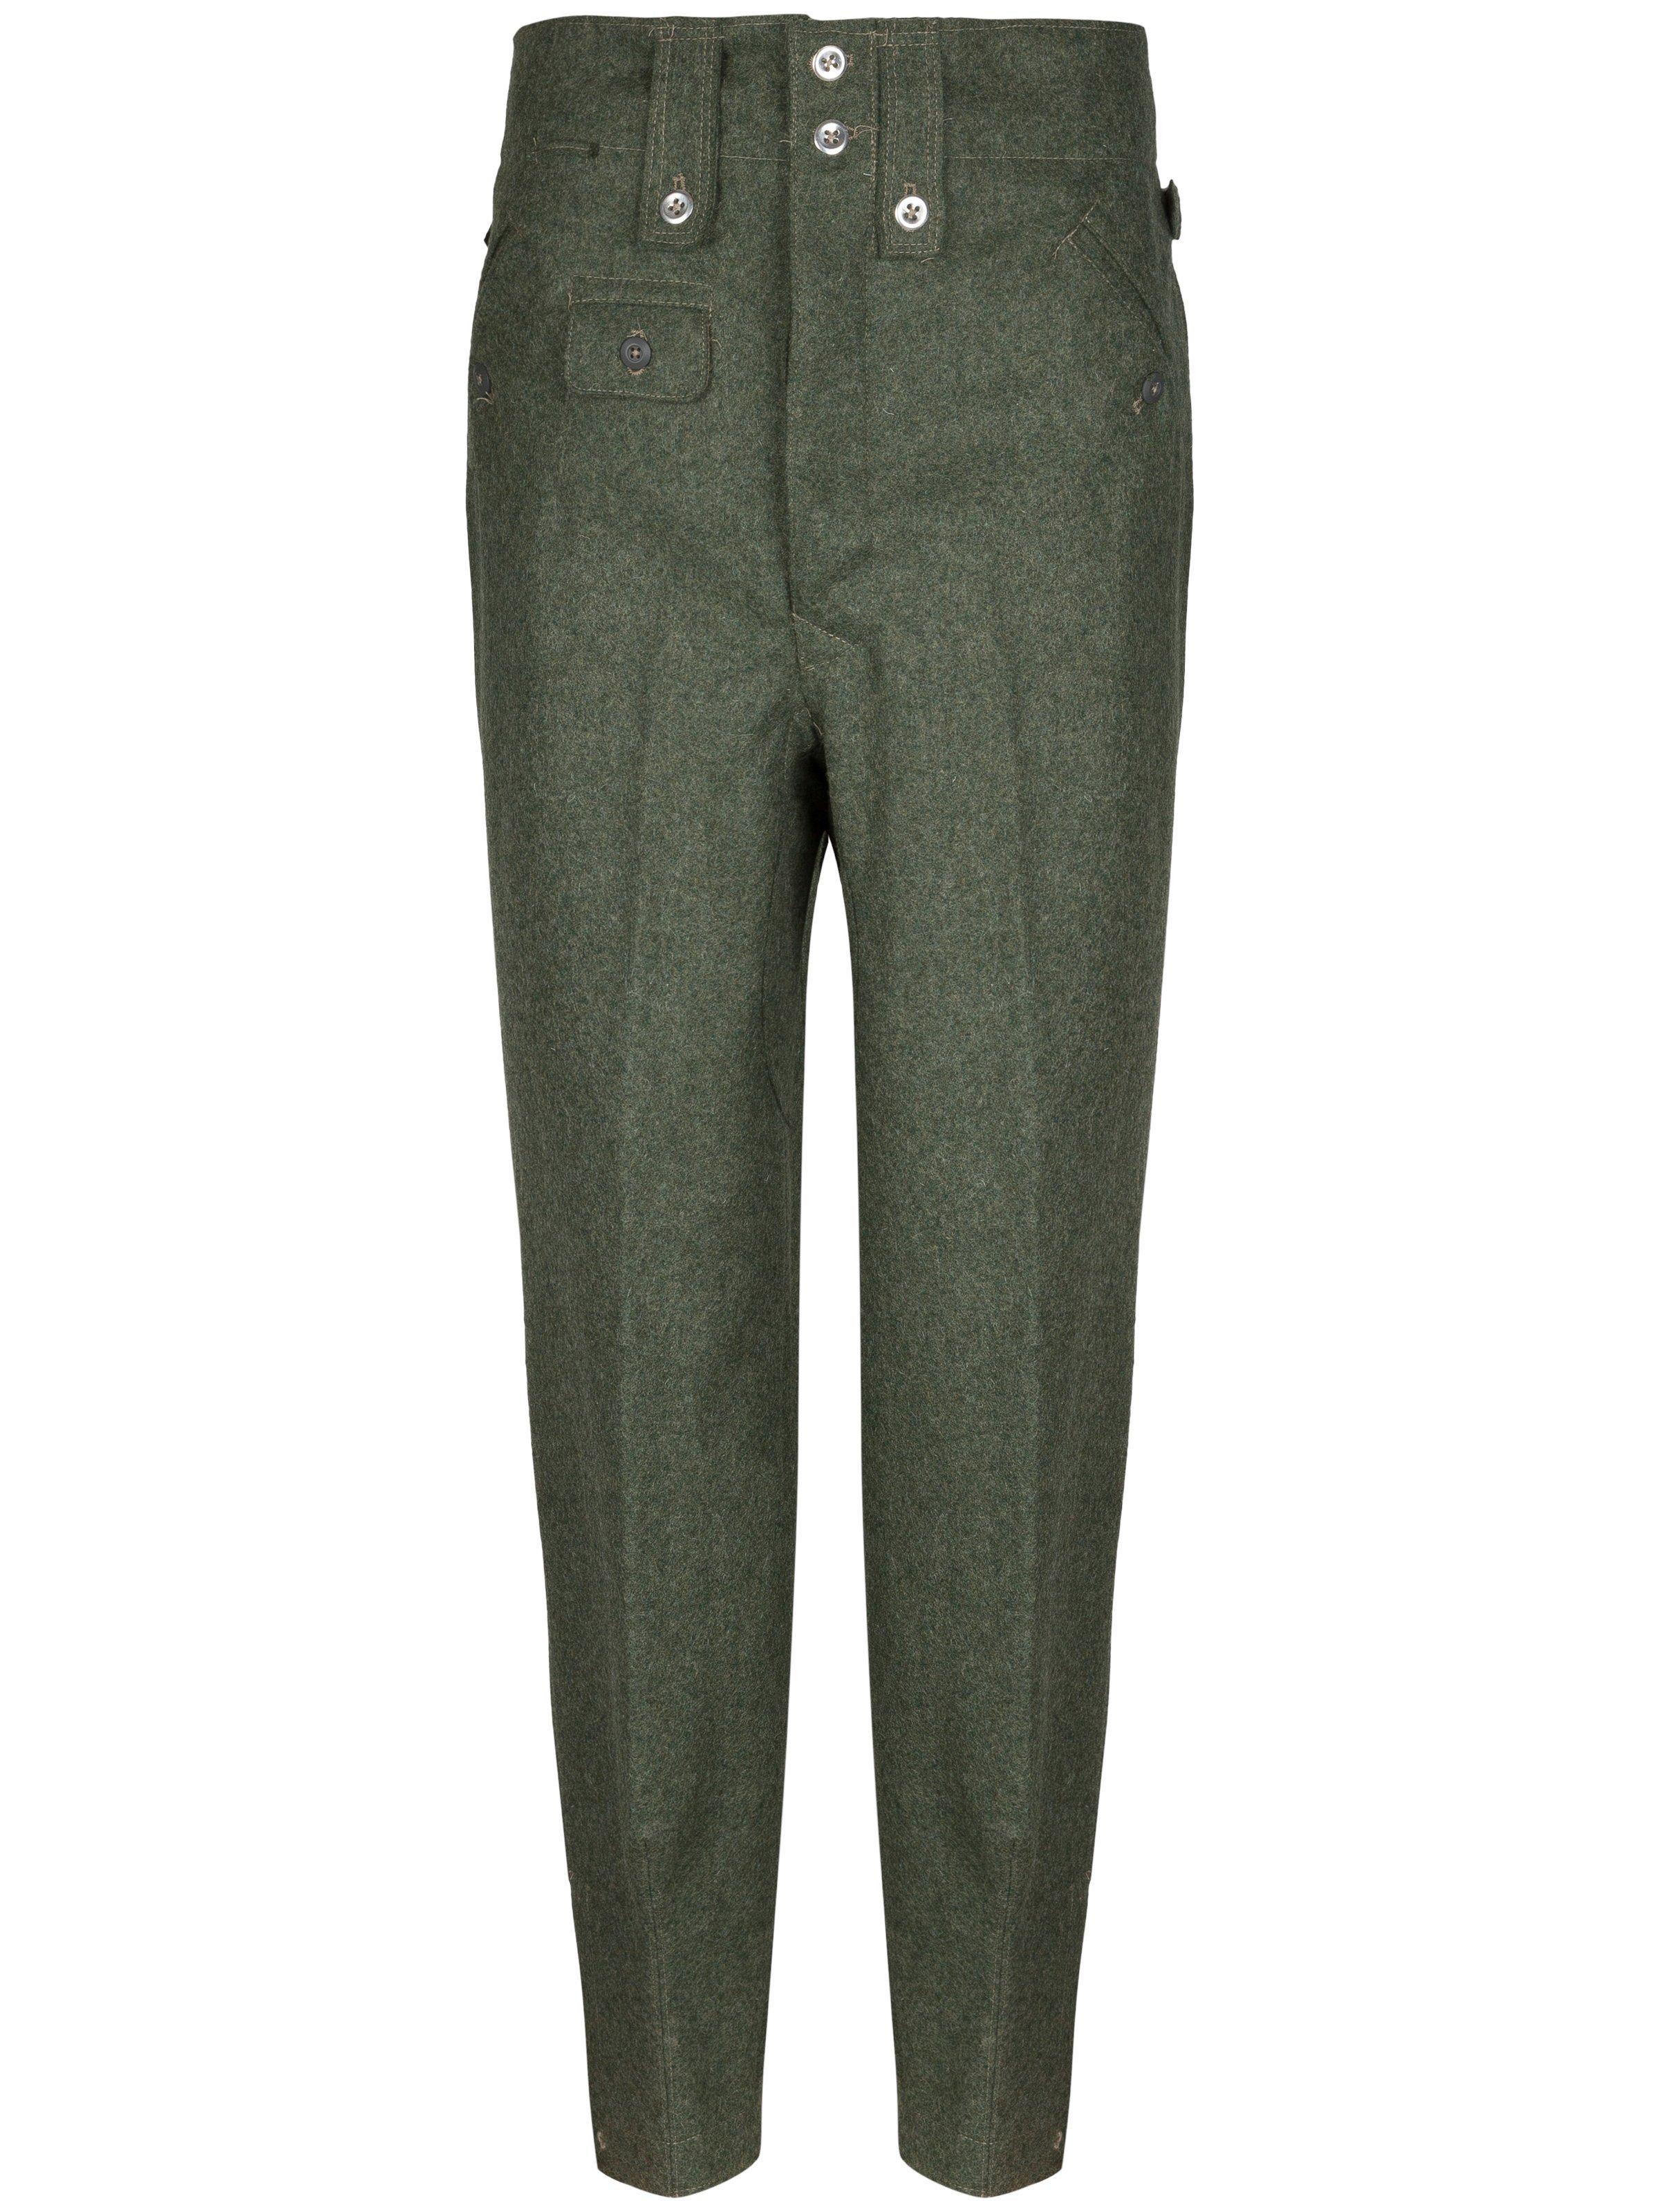 7eabeb63172 M43 Feldhose - WH SS field trousers - repro by Sturm 46